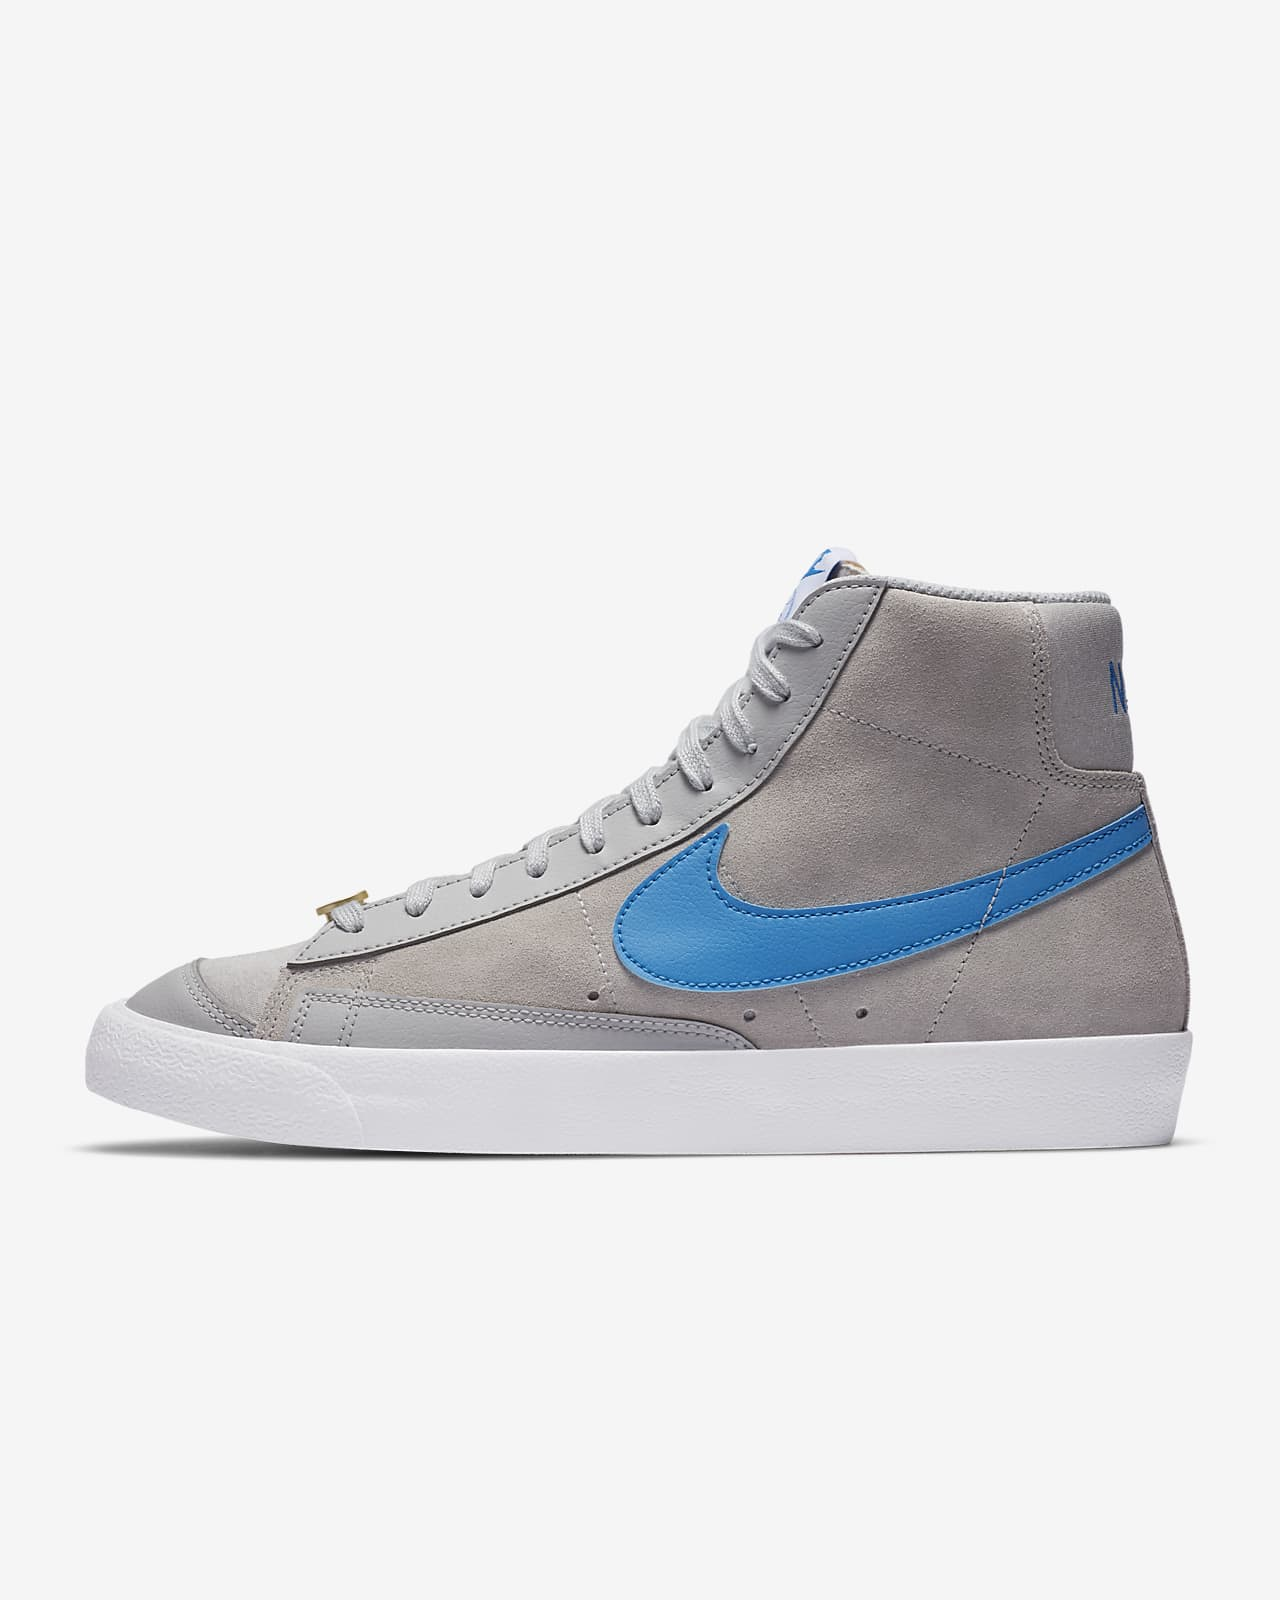 Nike Blazer Mid '77 NRG Men's Shoe